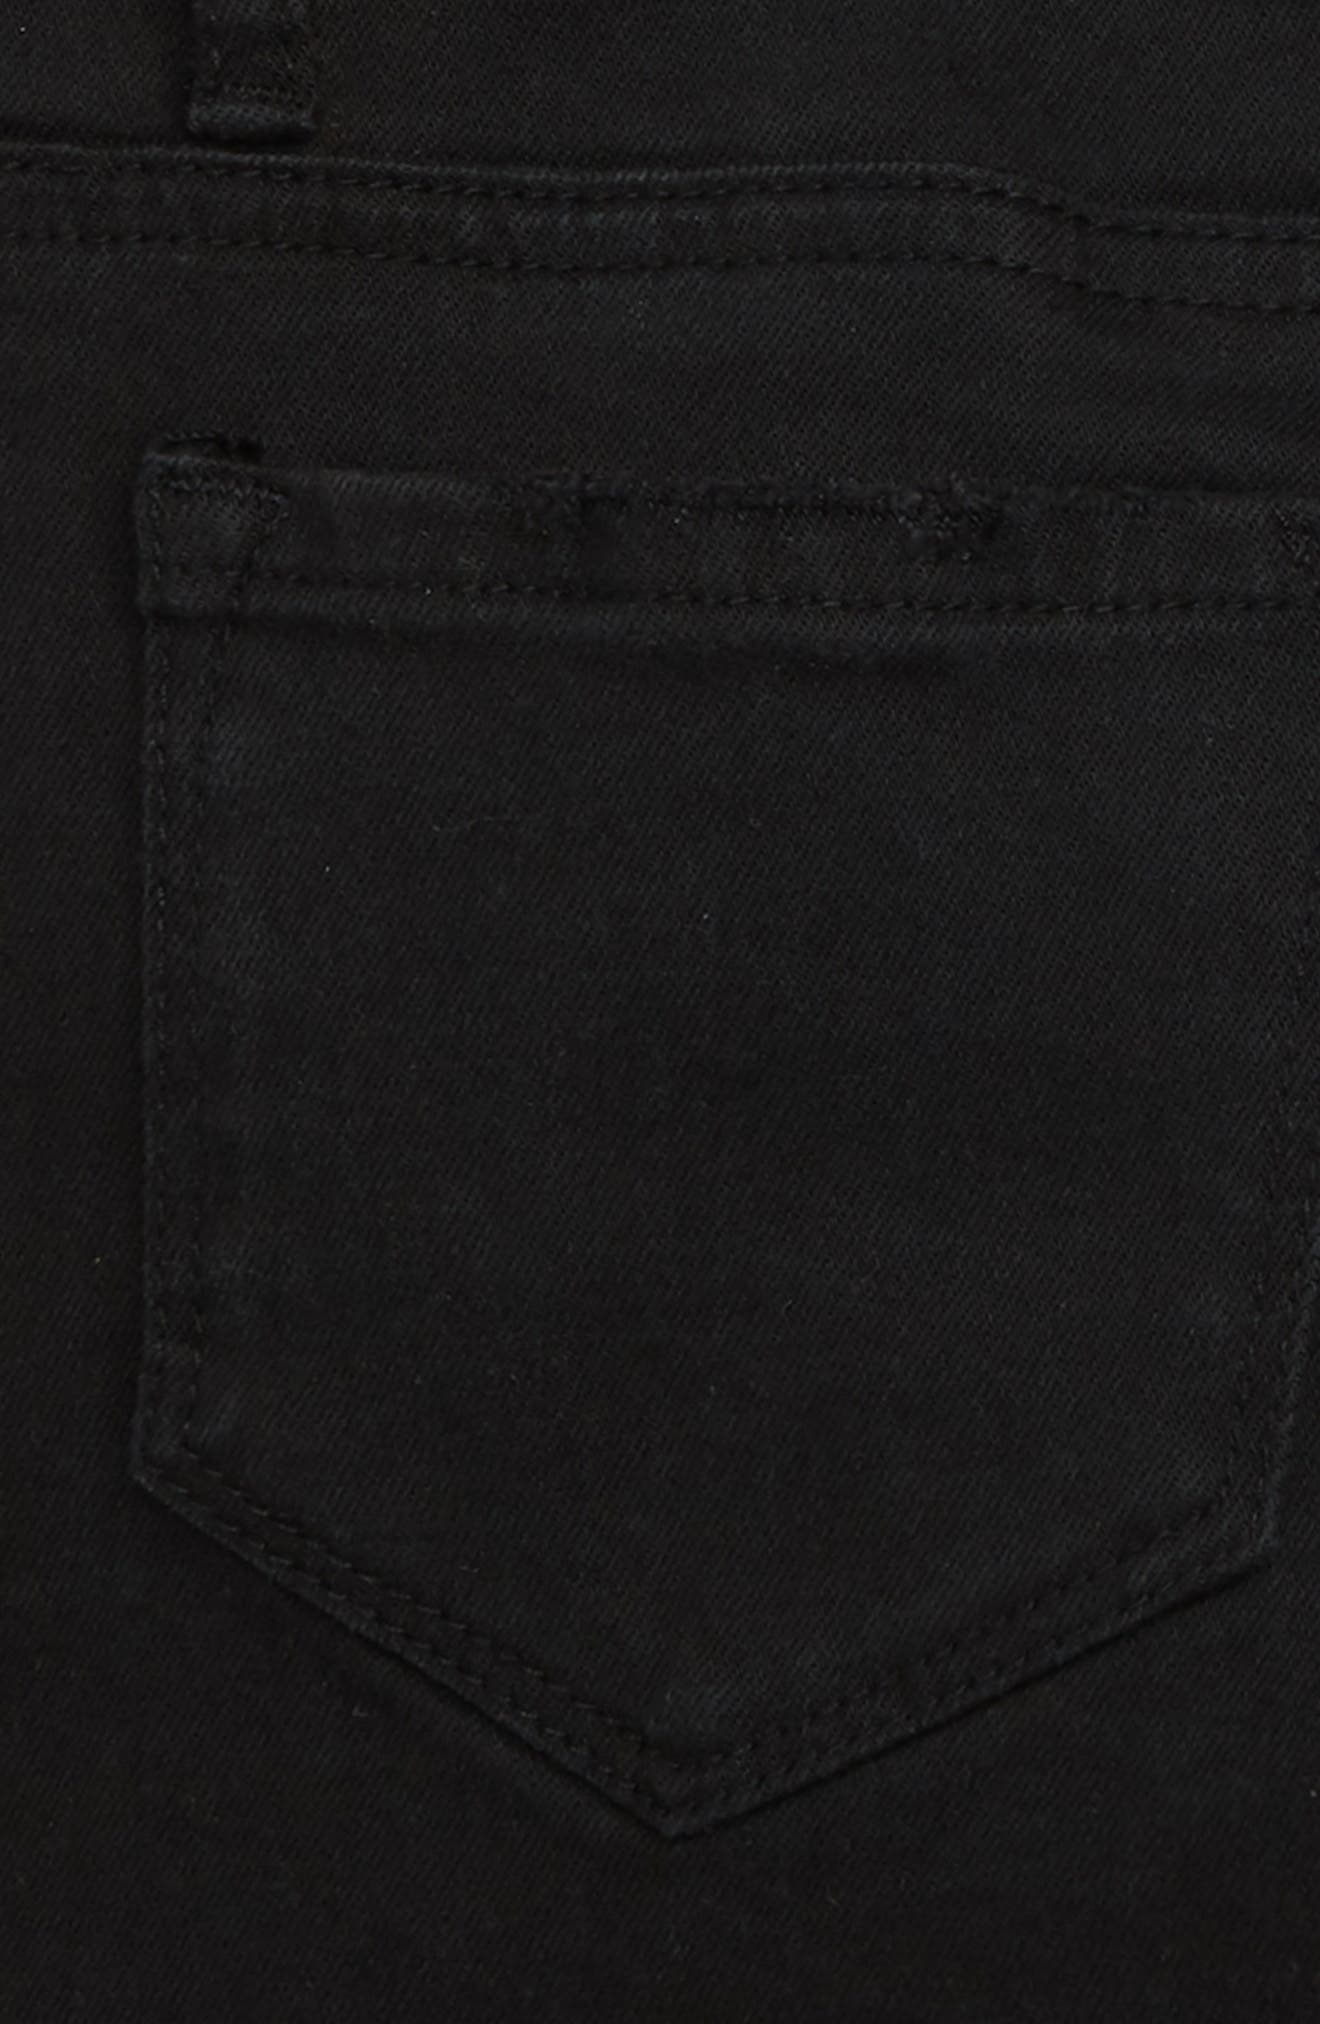 Cutoff Denim Shorts,                             Alternate thumbnail 3, color,                             BLACK